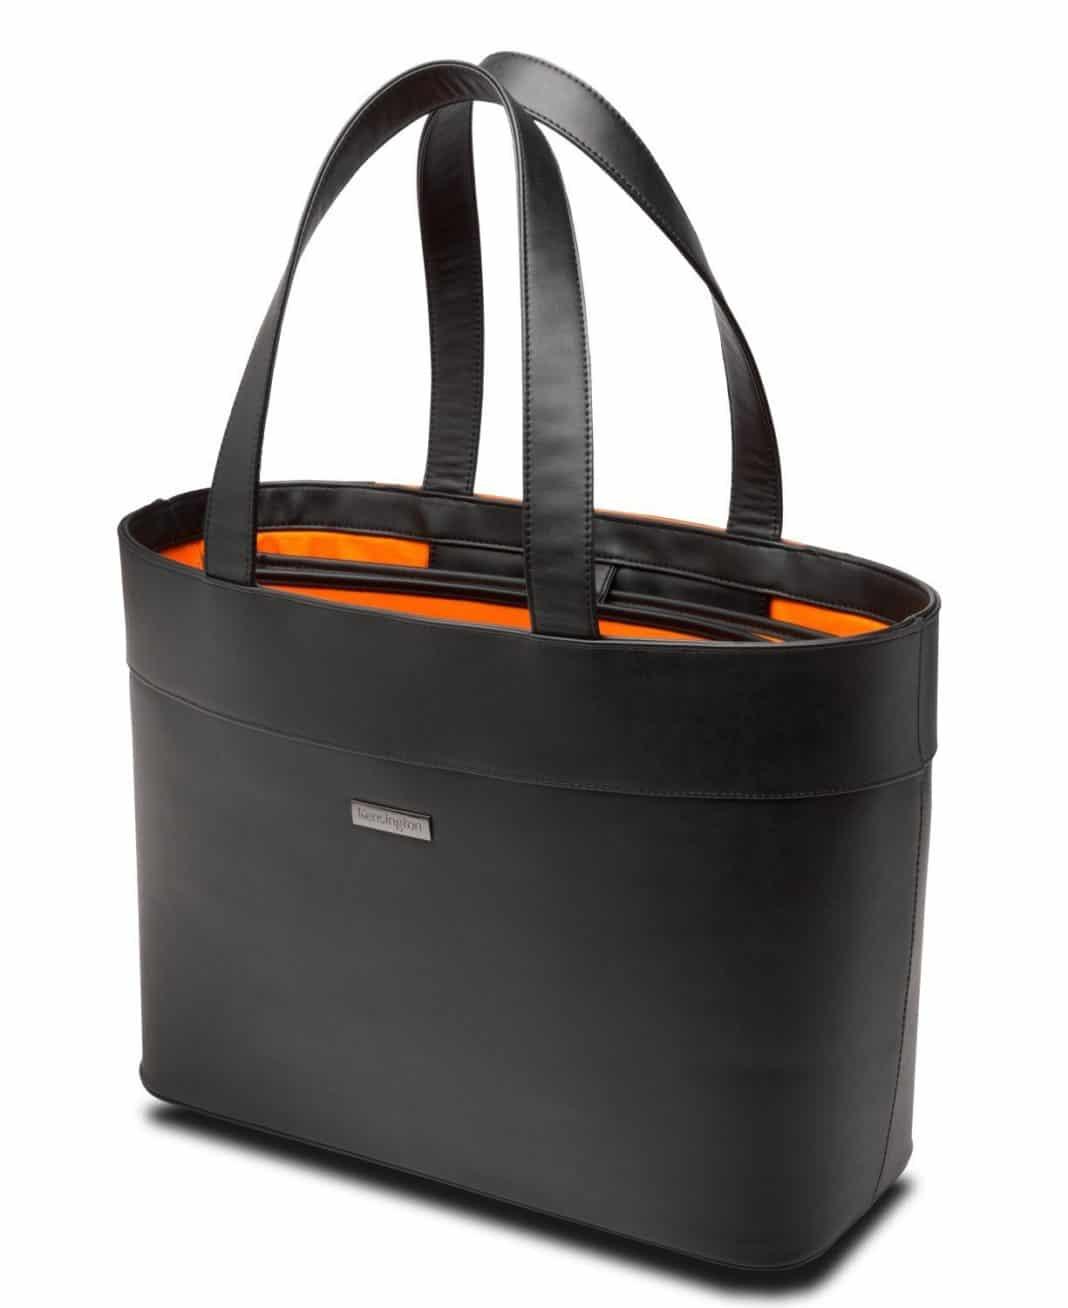 Travel Tote Bags Best Totes Vera Bradley